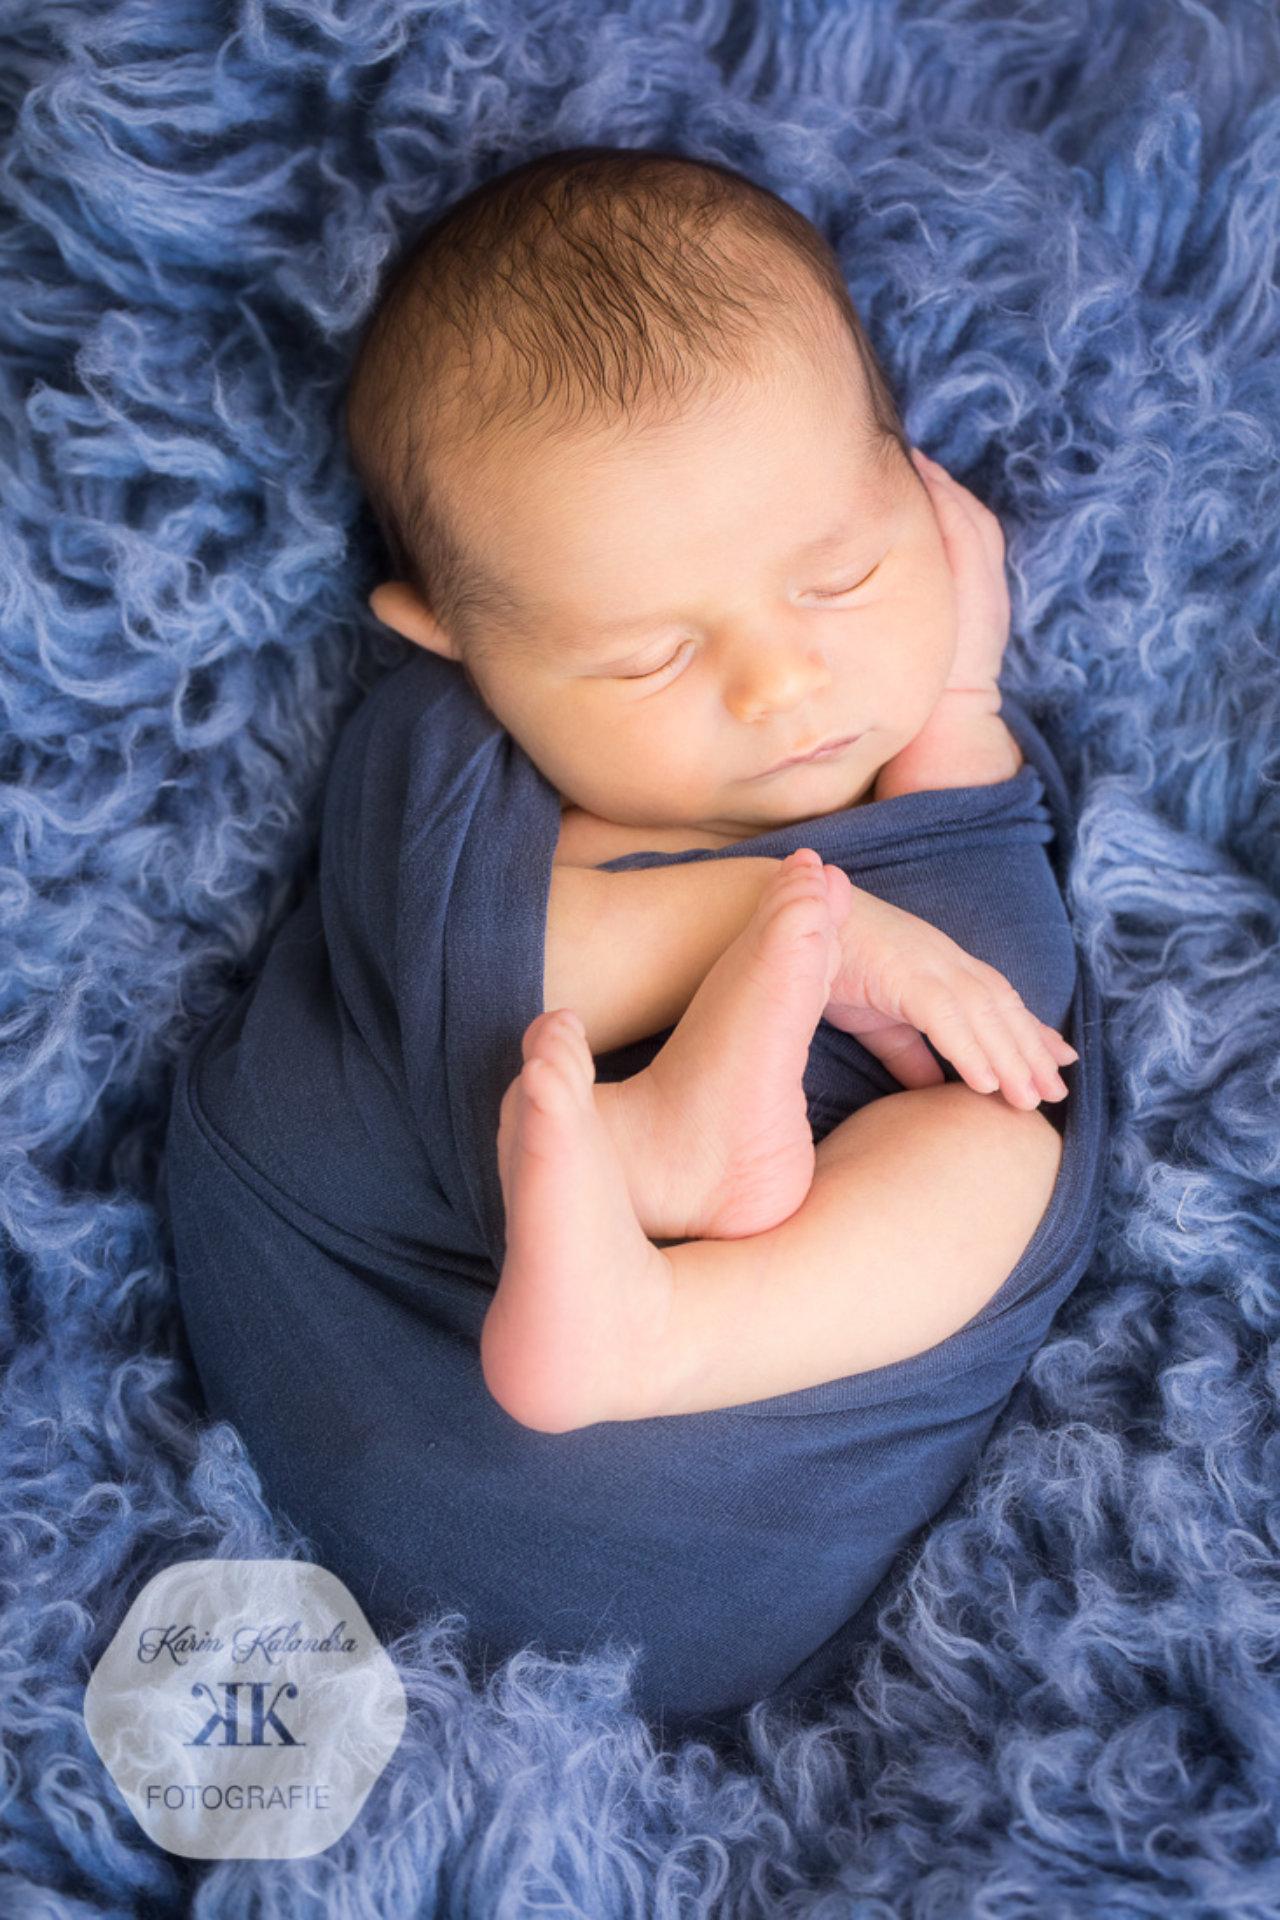 Neugeborenenshooting Wien #7